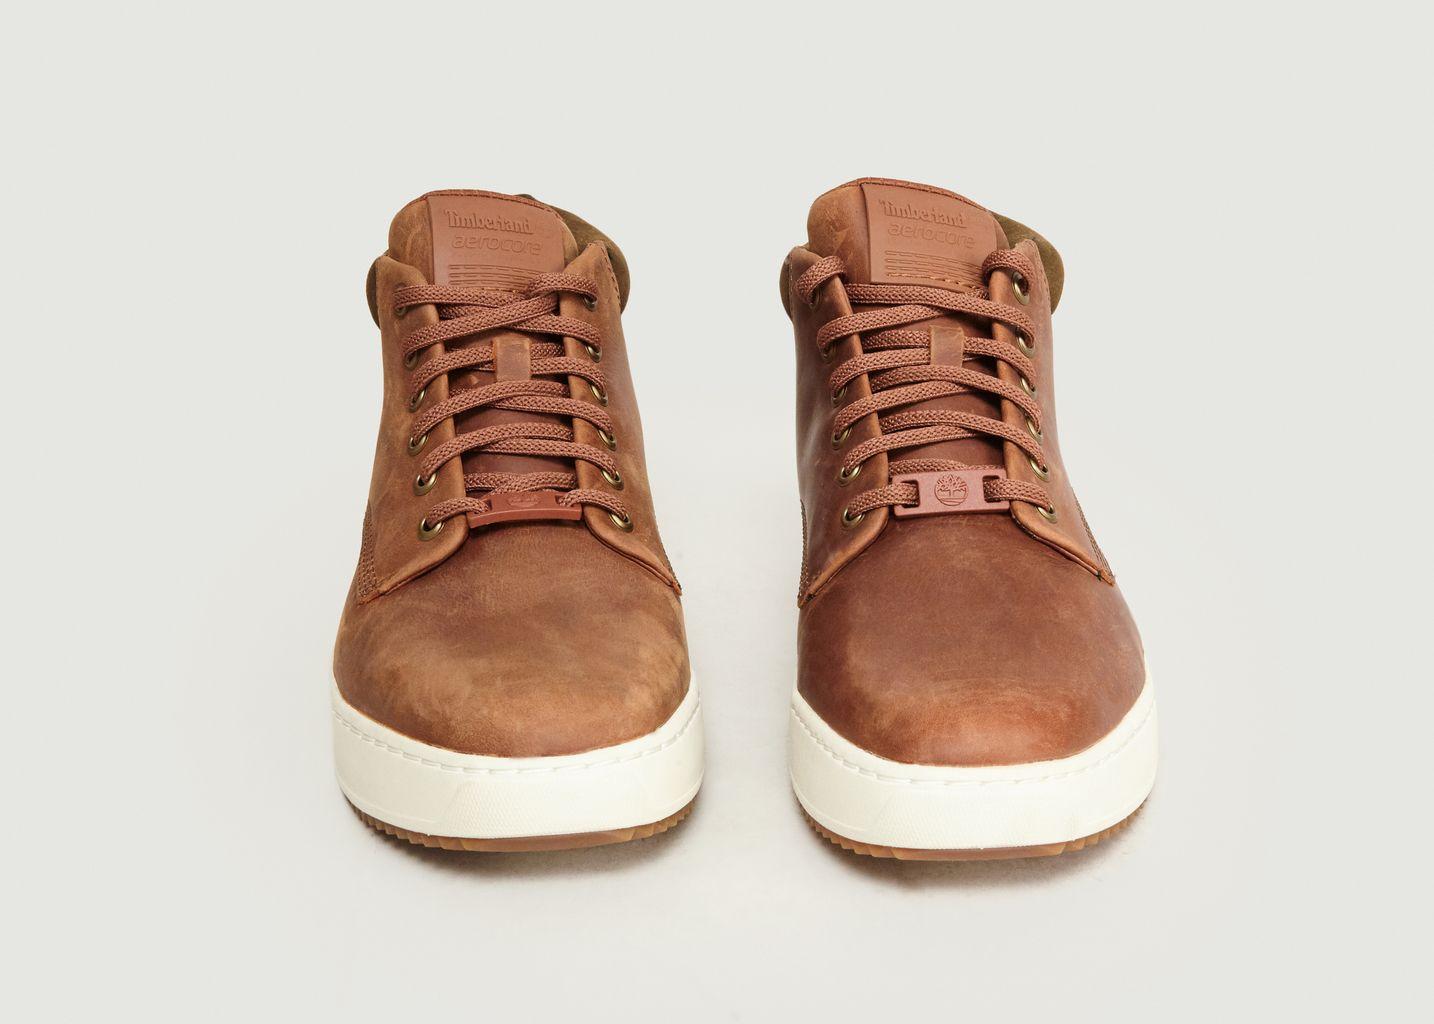 Boots Roam Cupsole Basse Marron TimberlandL'exception City v0m8wNn